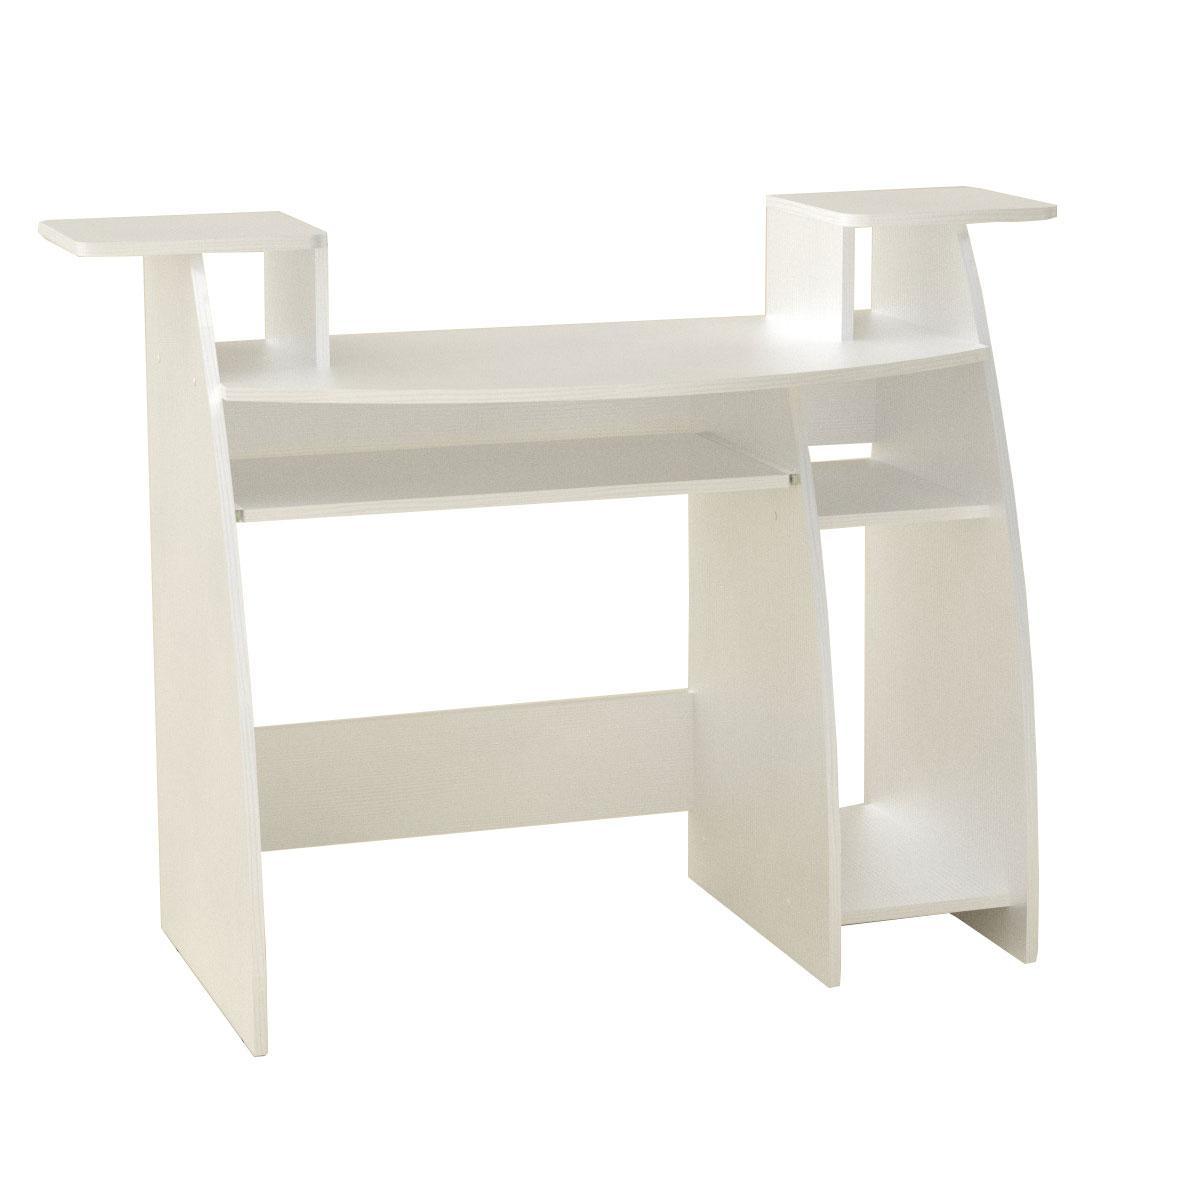 Стол компьютерный СКМ-4 белый Компанит (123х50х92 см)